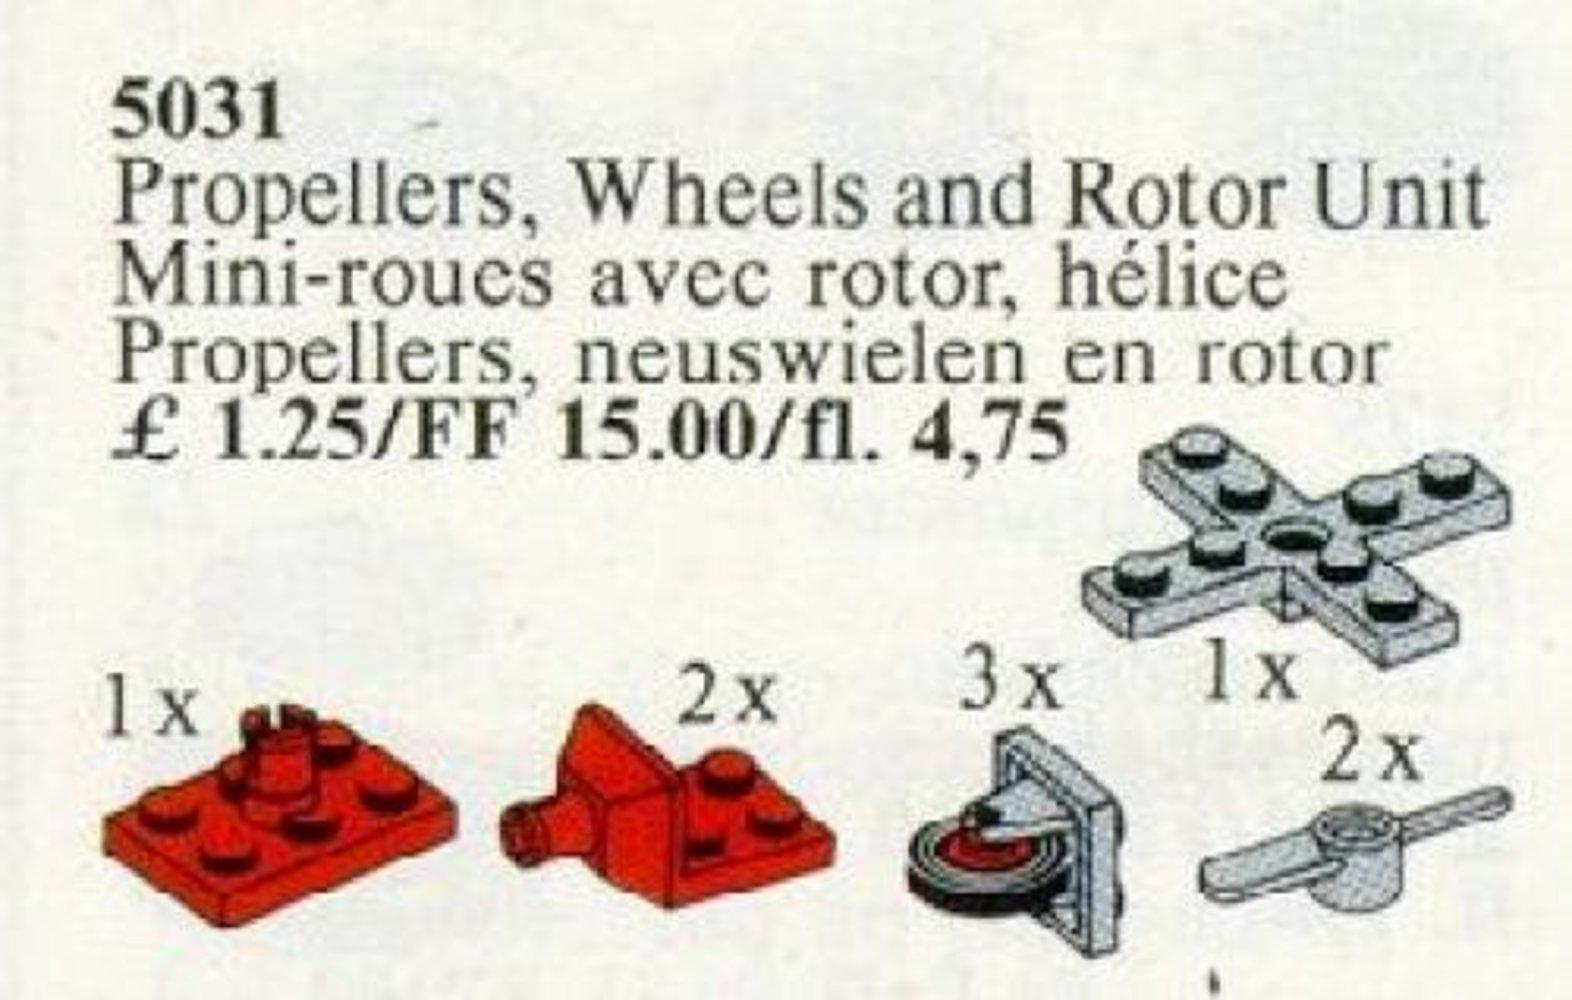 Propellers, Wheels, Rotor Unit